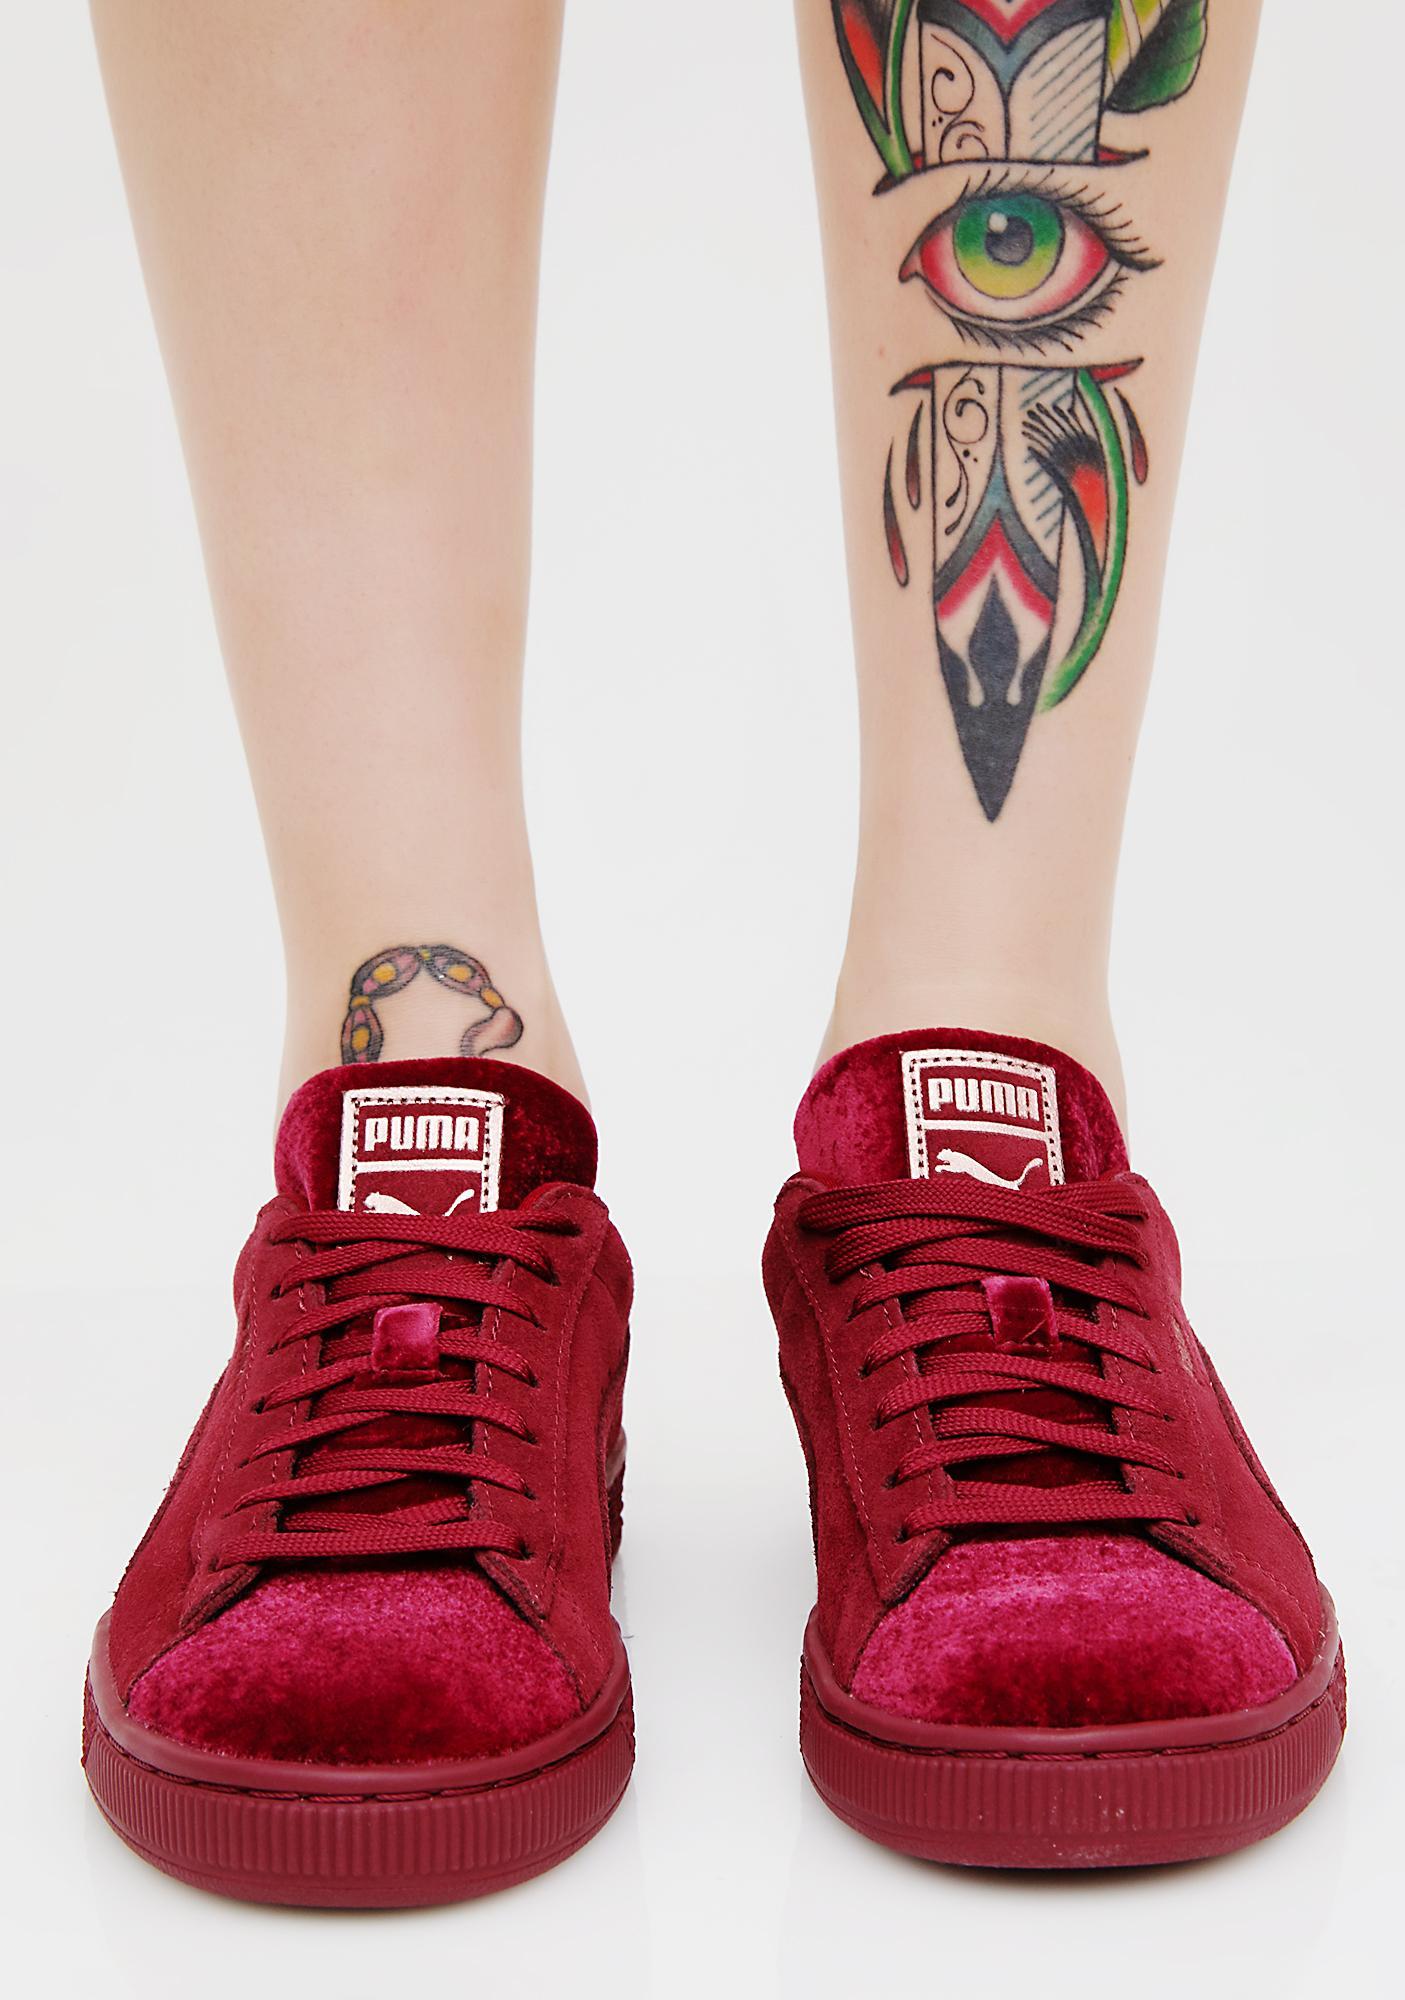 7d04db18e256 ... PUMA Suede Classic Velvet Sneakers ...